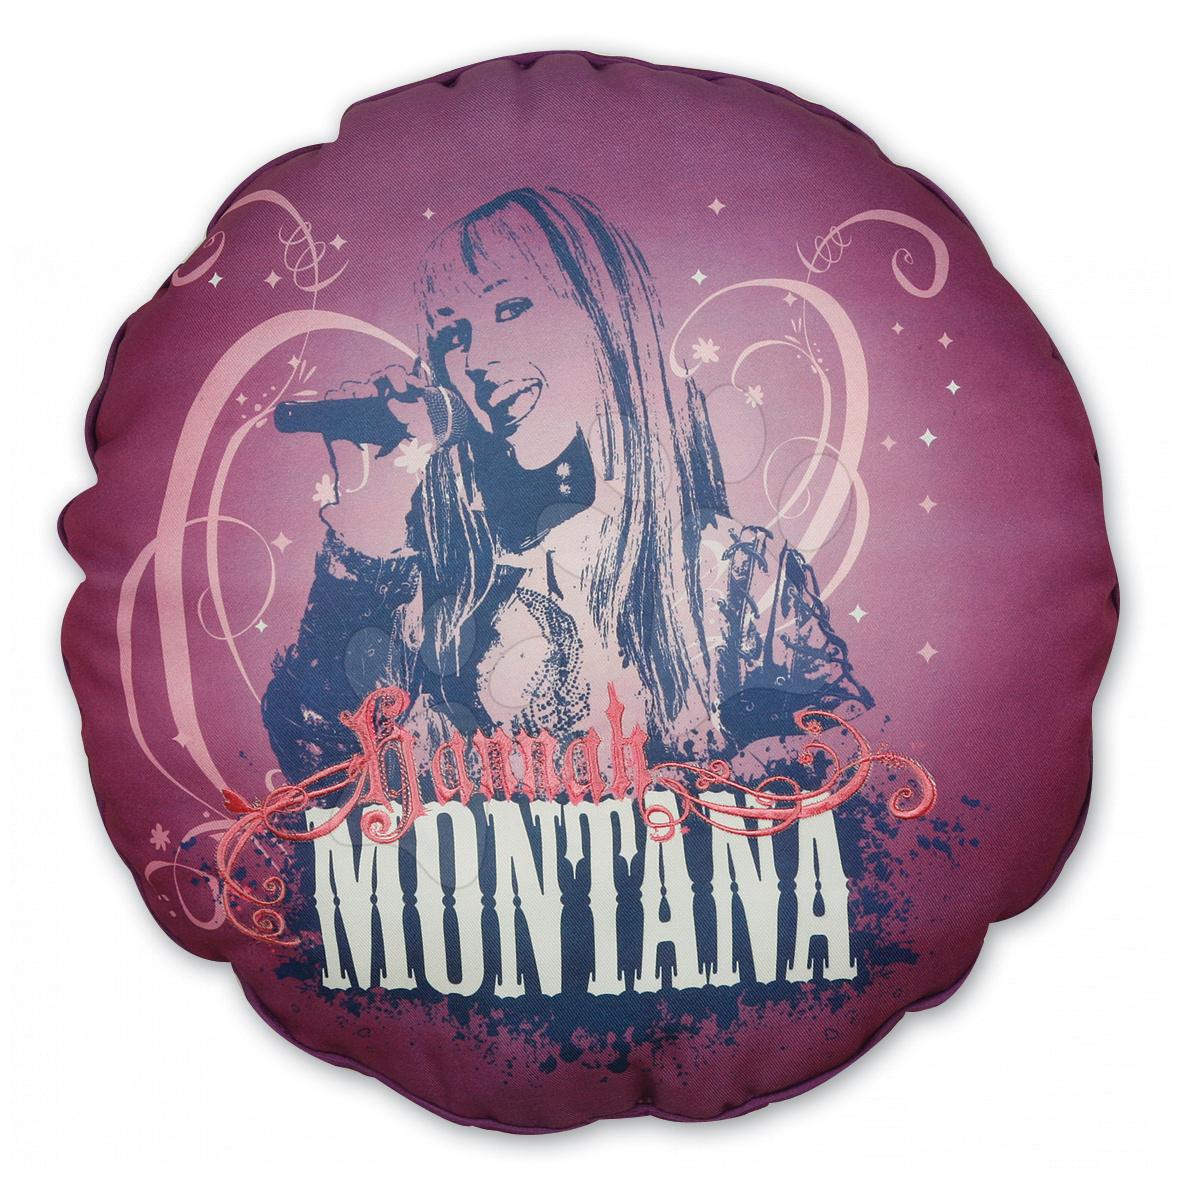 Hanna Montana pink polštářek Ilanit 36 cm